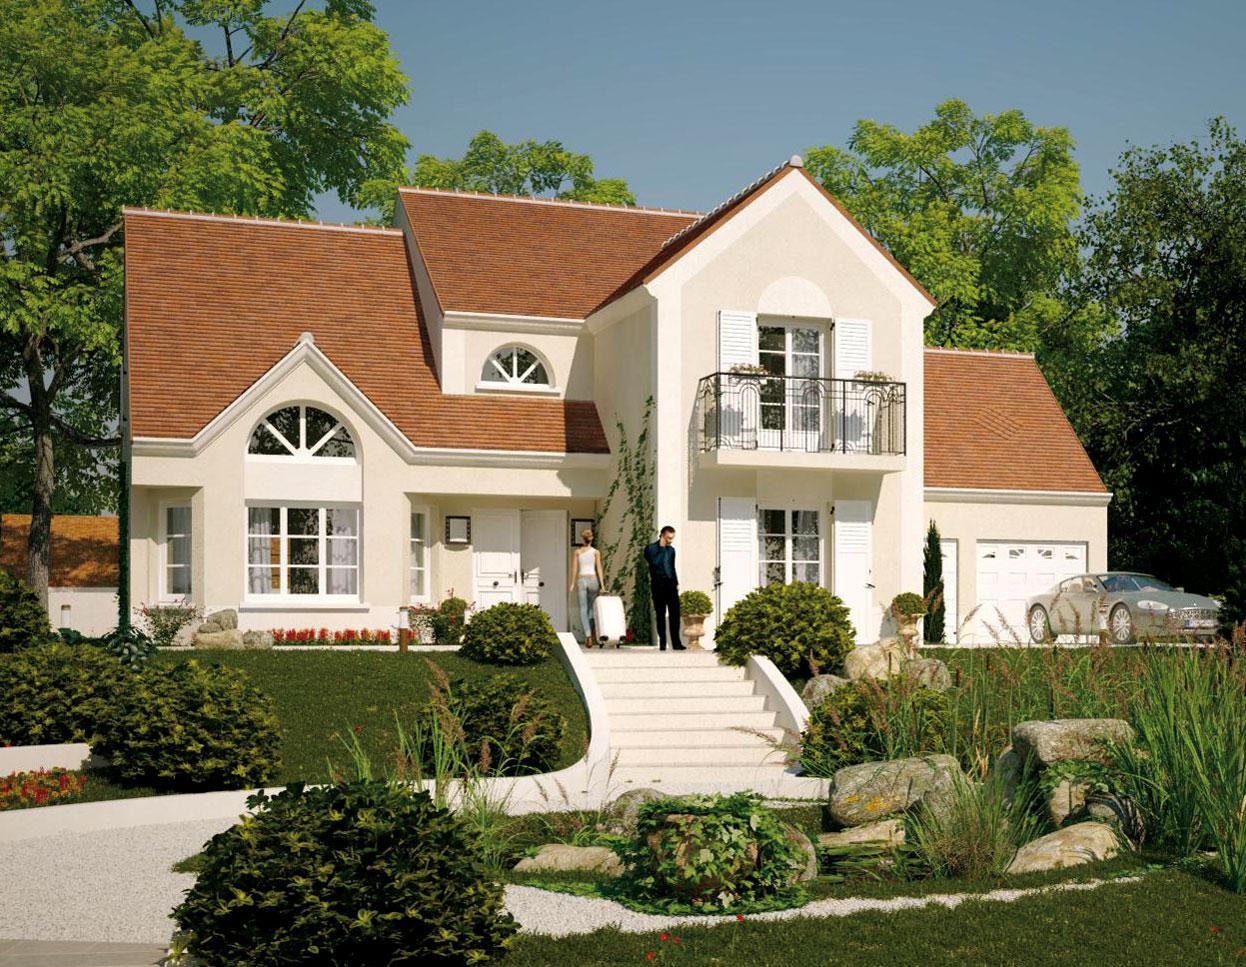 Modele de maison a construire moderne - vvivante